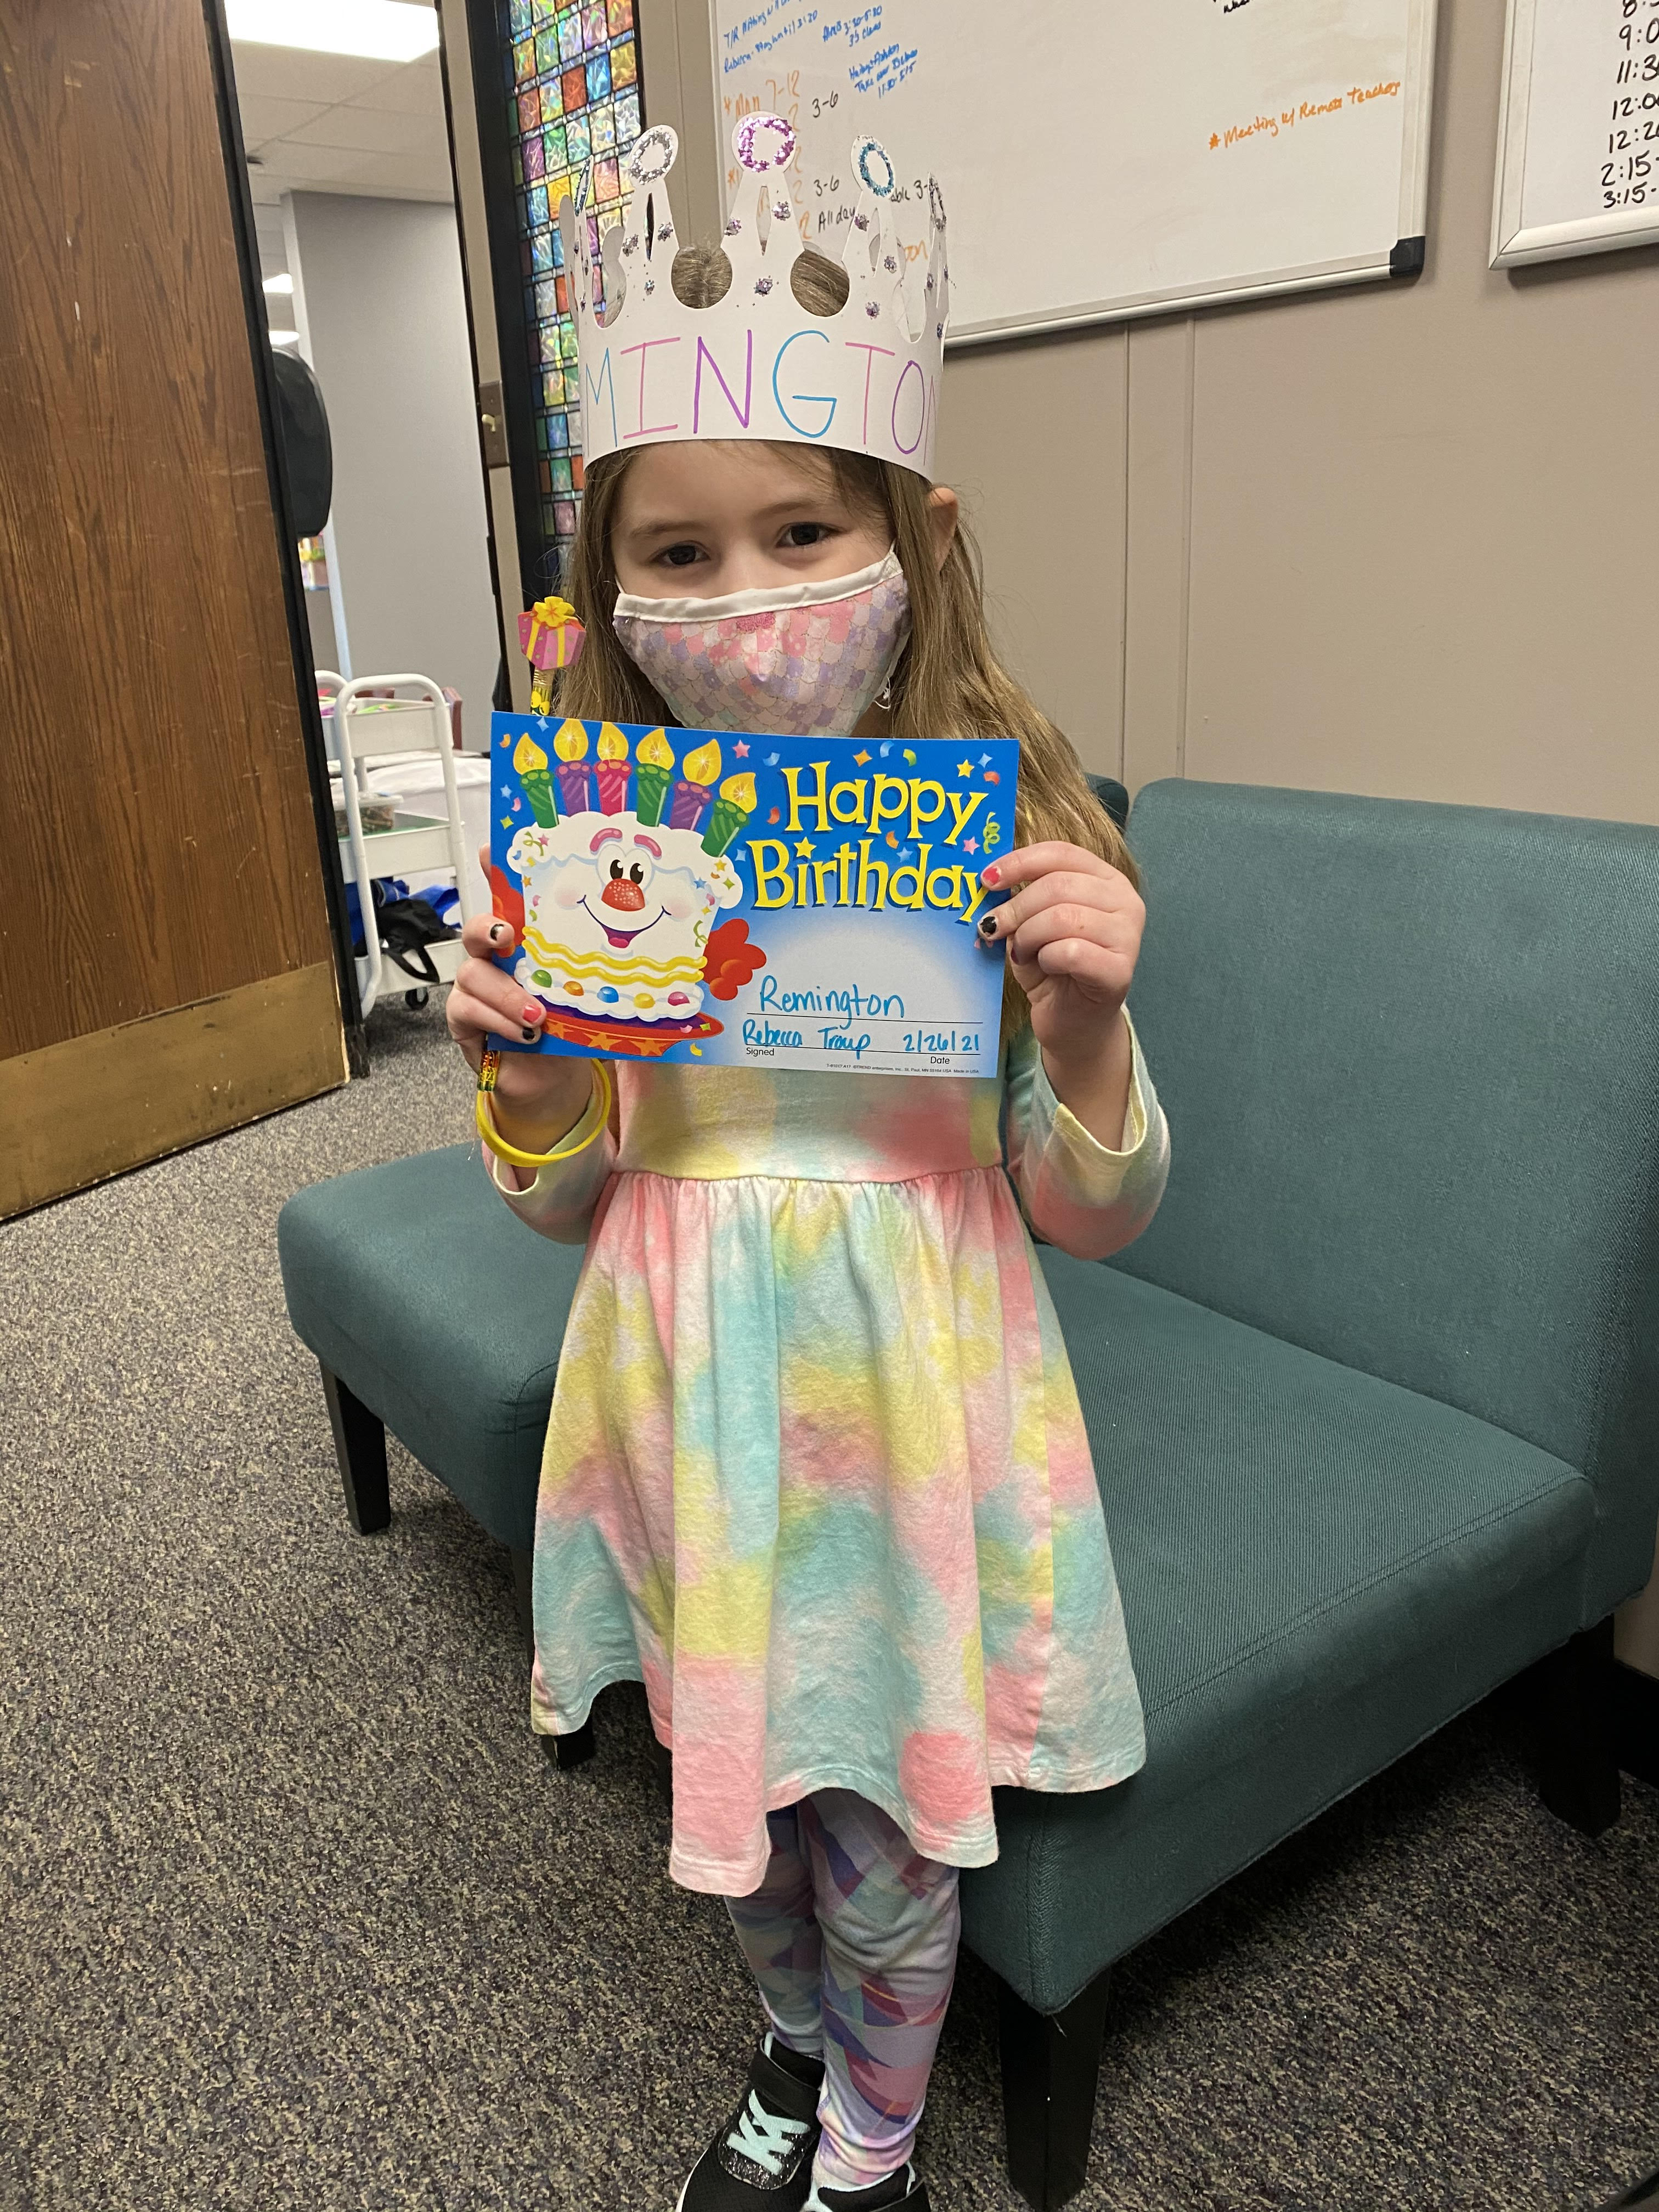 Sending Remington a Happy Happy Birthday!